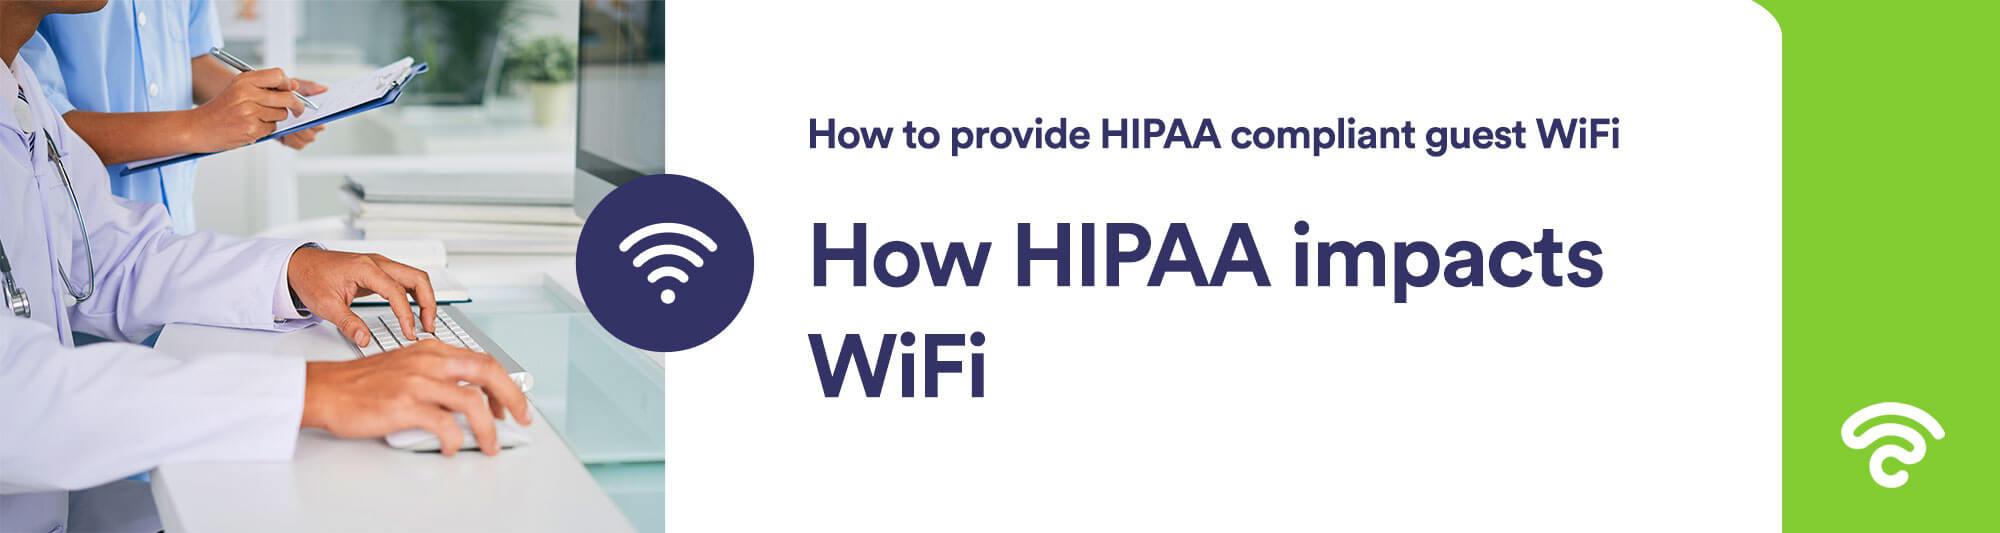 how HIPAA impacts WiFi